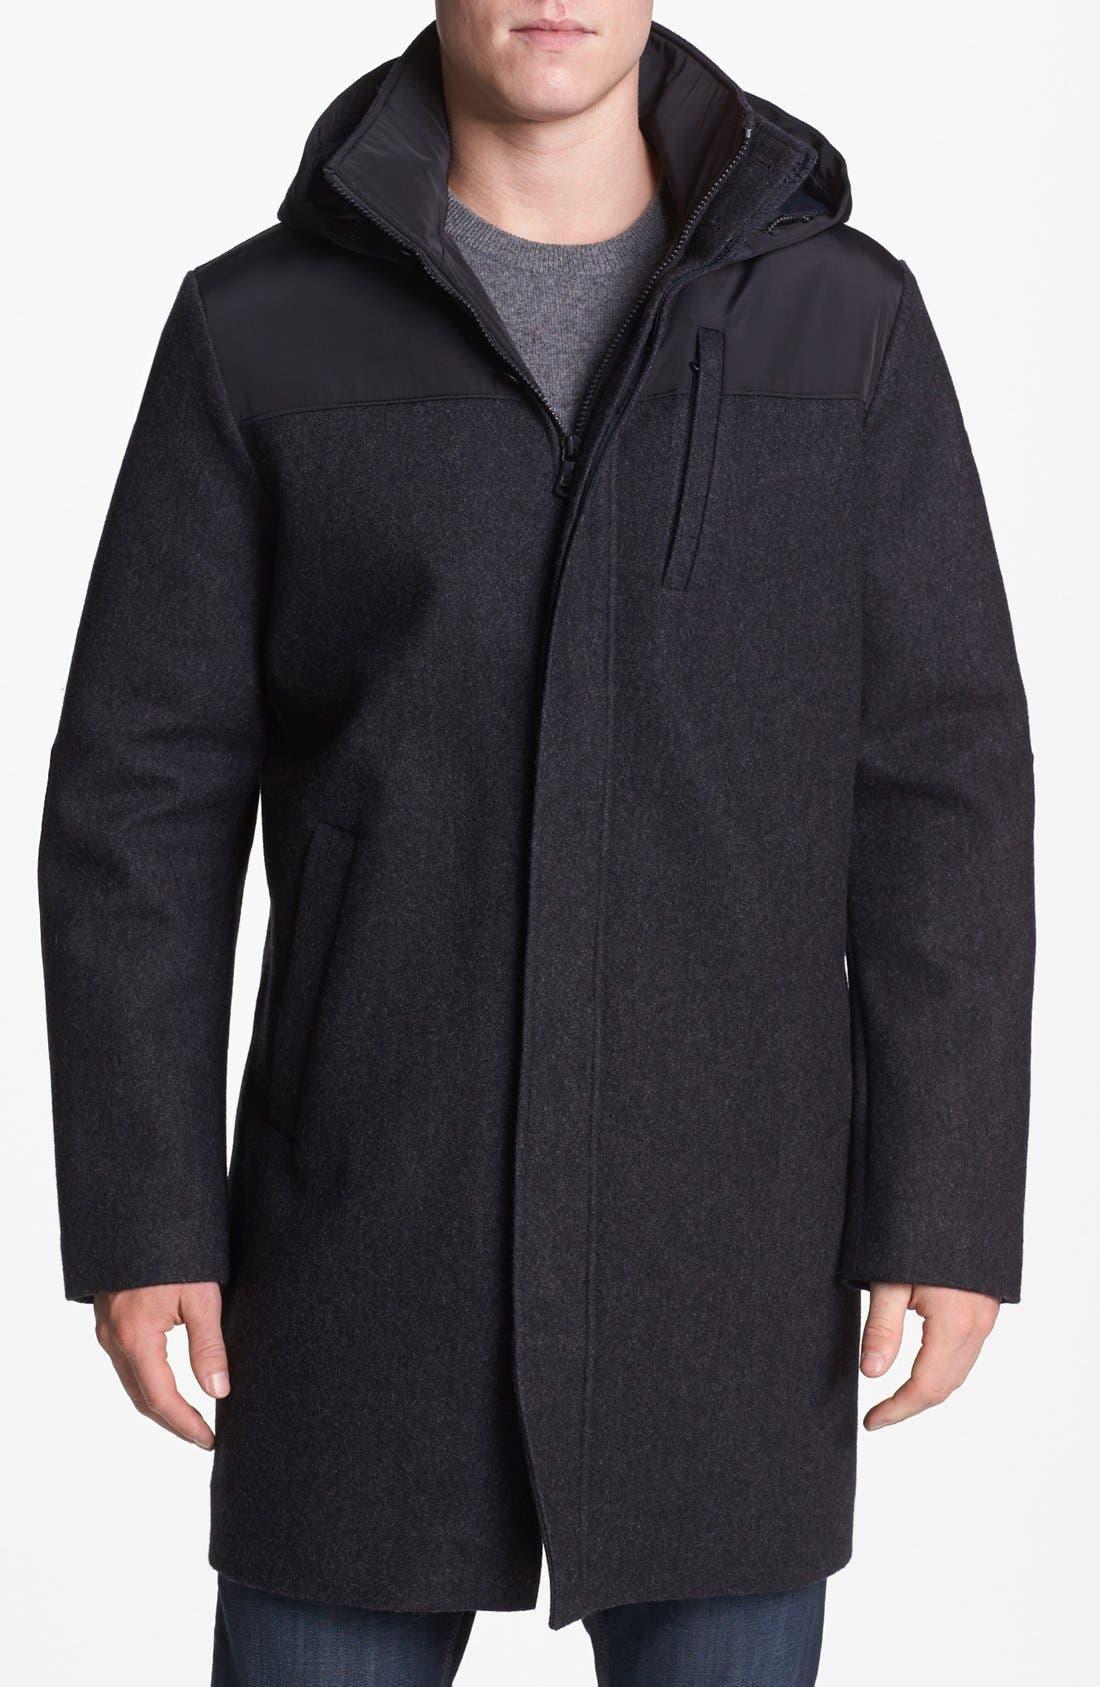 Main Image - Victorinox Swiss Army® 'Shuttle' Wool Blend Coat